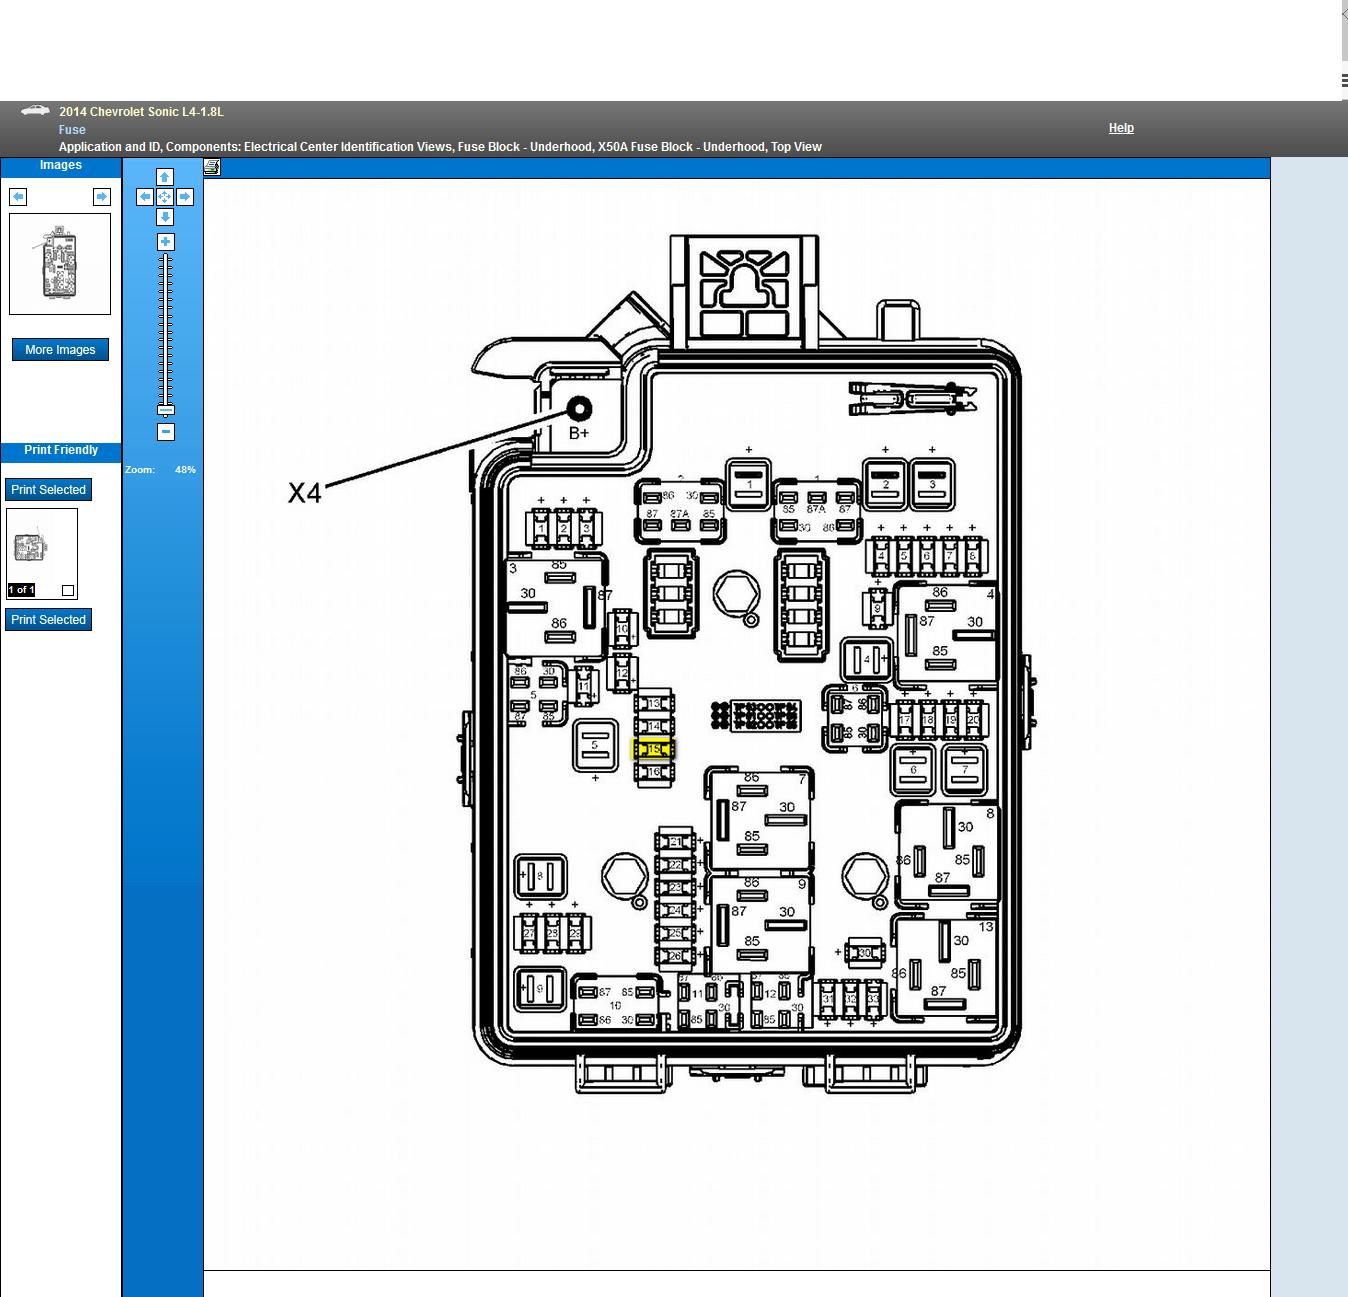 Chevrolet Sonic Fuse Box Online Schematics Diagram 12 Impala I Have 2014 Engine 1 8 And Code P0449 Int Geo